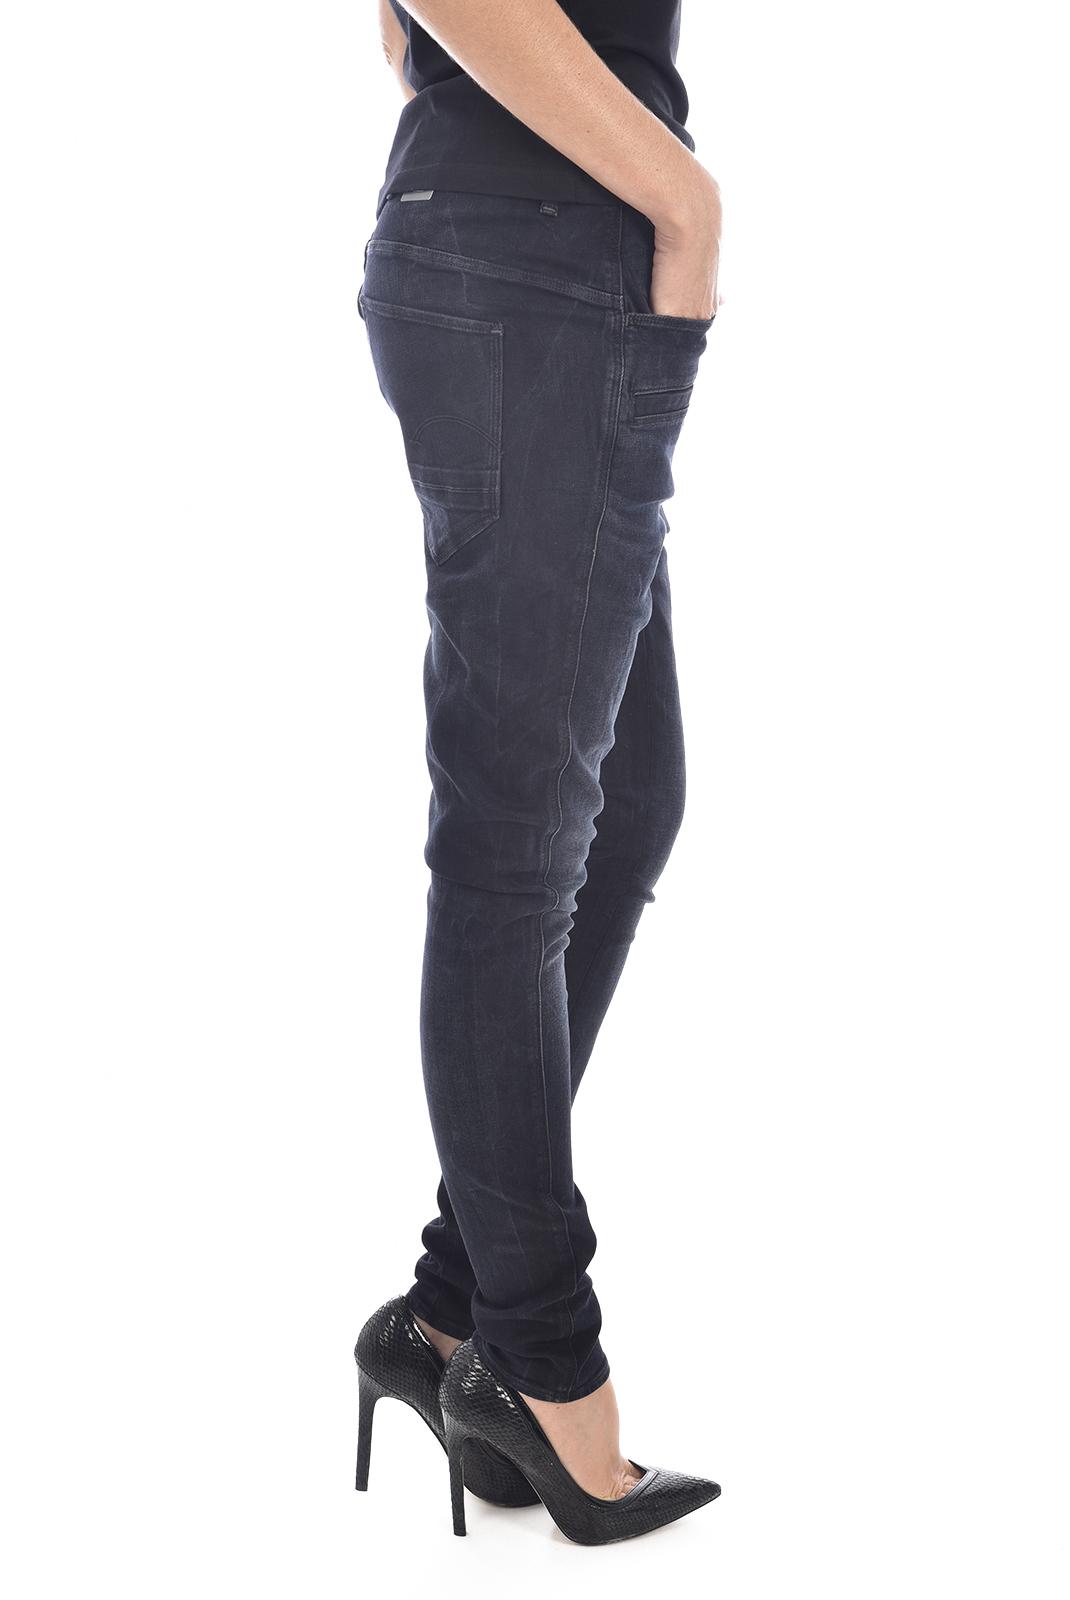 Jeans   G-star 60893.6545.89 NOIR